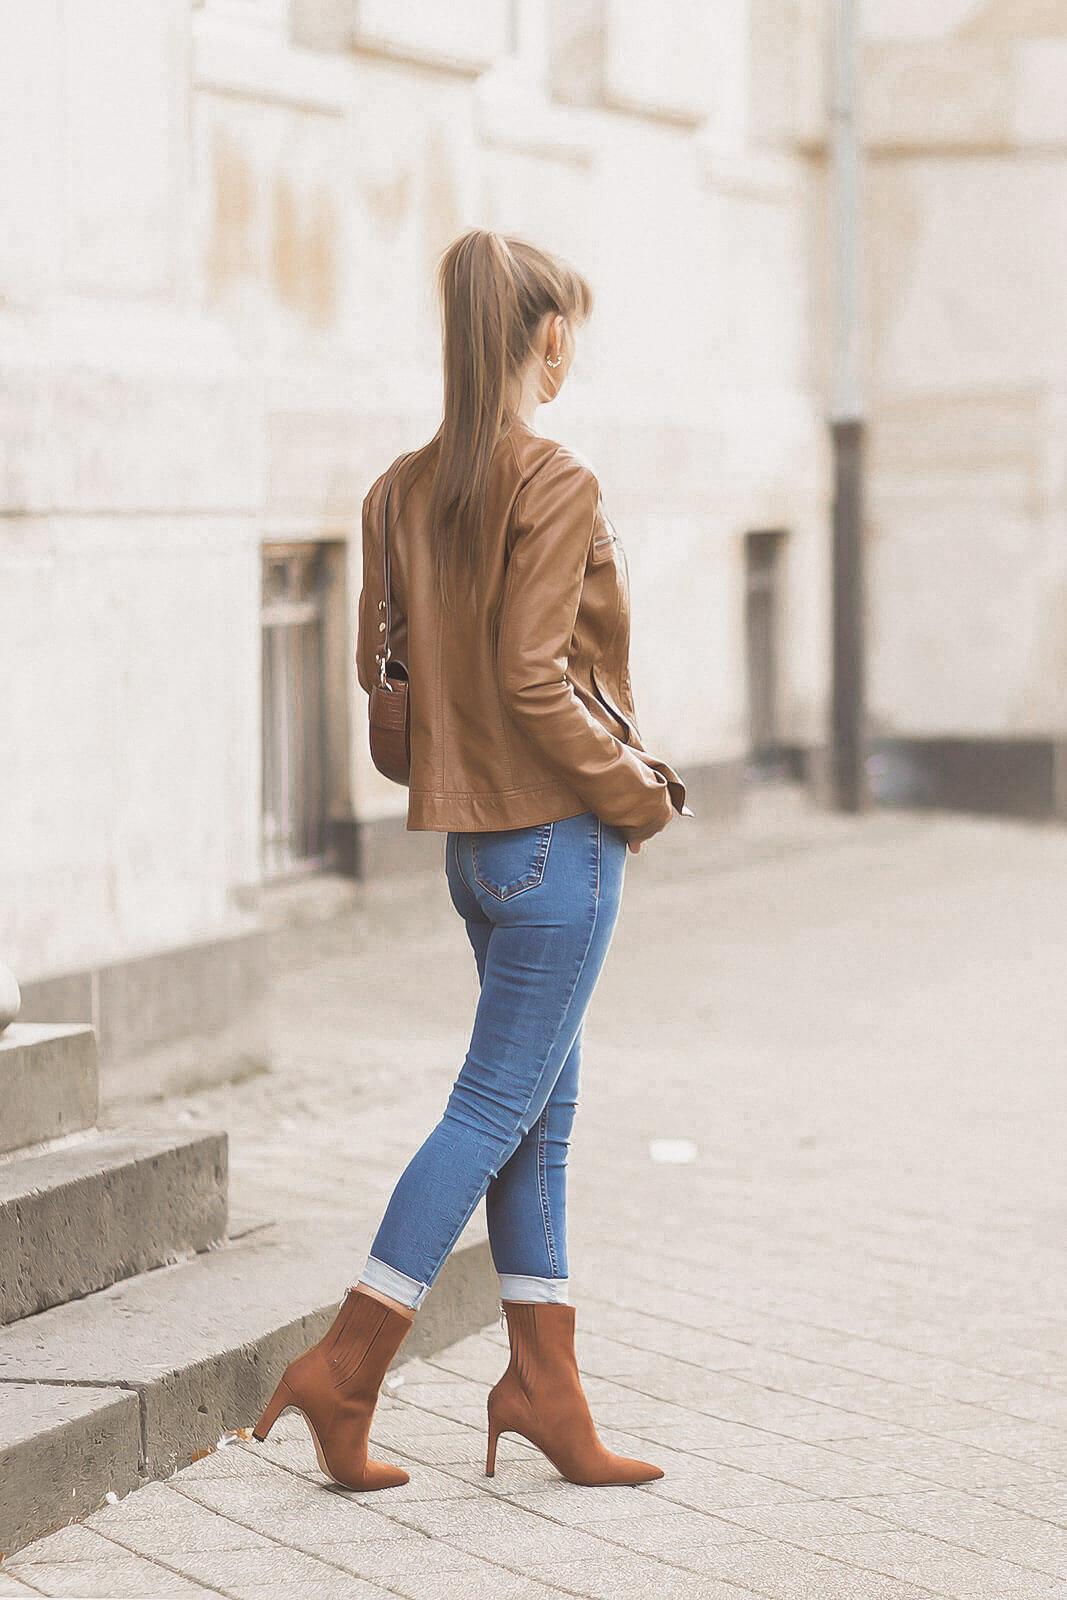 Braune Lederjacken stylen, Herbstoutfit mit Lederjacke, Herbsttrend, Shoelove by Deichmann